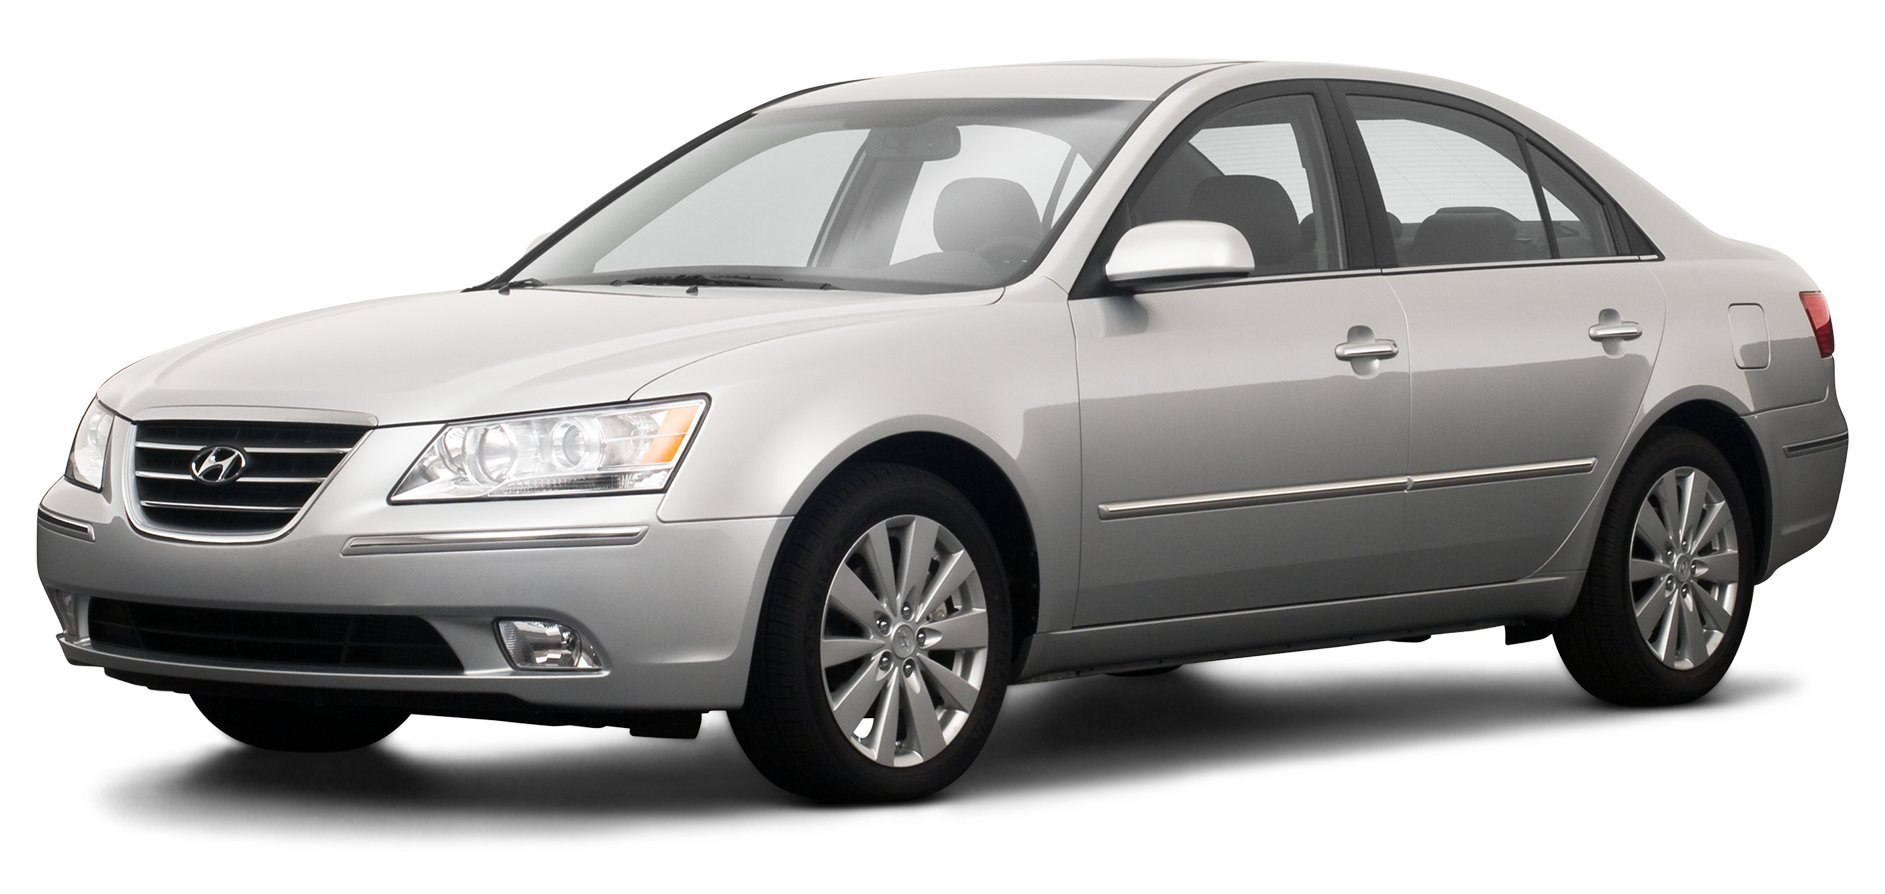 2009 chevrolet impala 3 5l lt 4 door sedan 2009 hyundai sonata limited 4 door sedan 4 cylinder automatic transmission